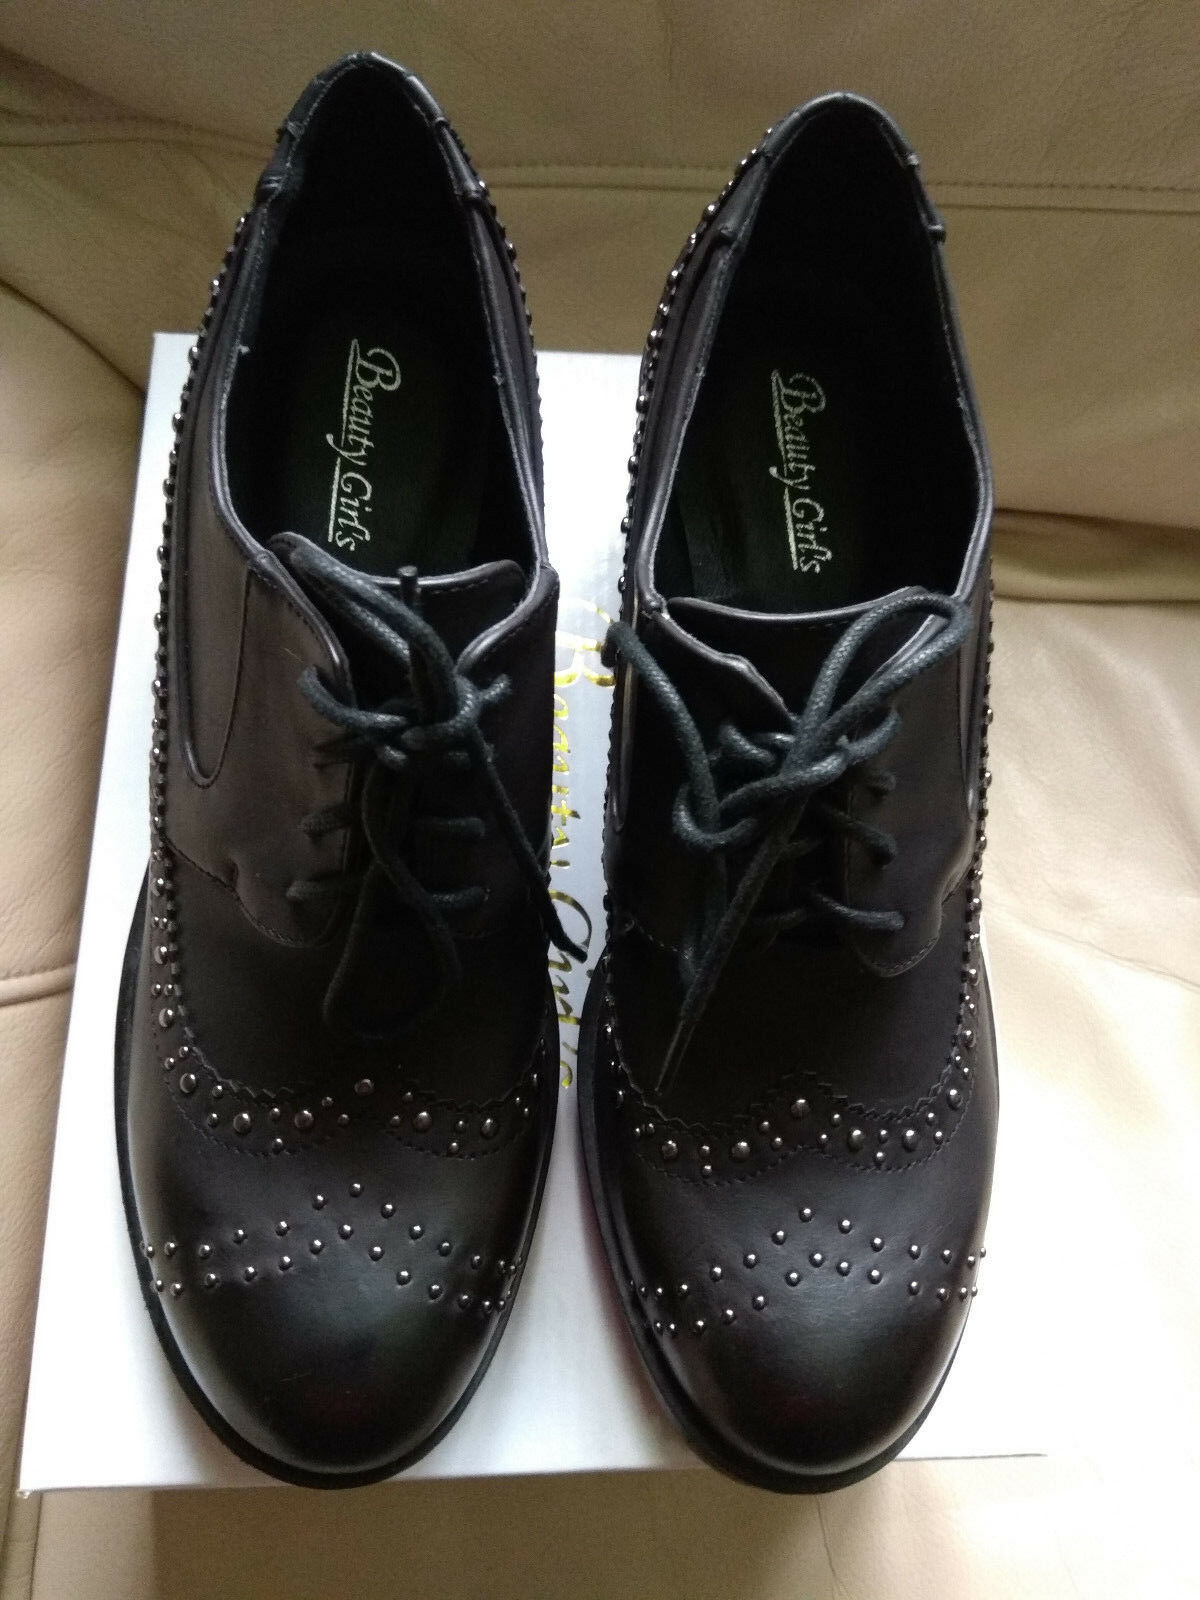 Beauty girls ladies heel shoes EU40